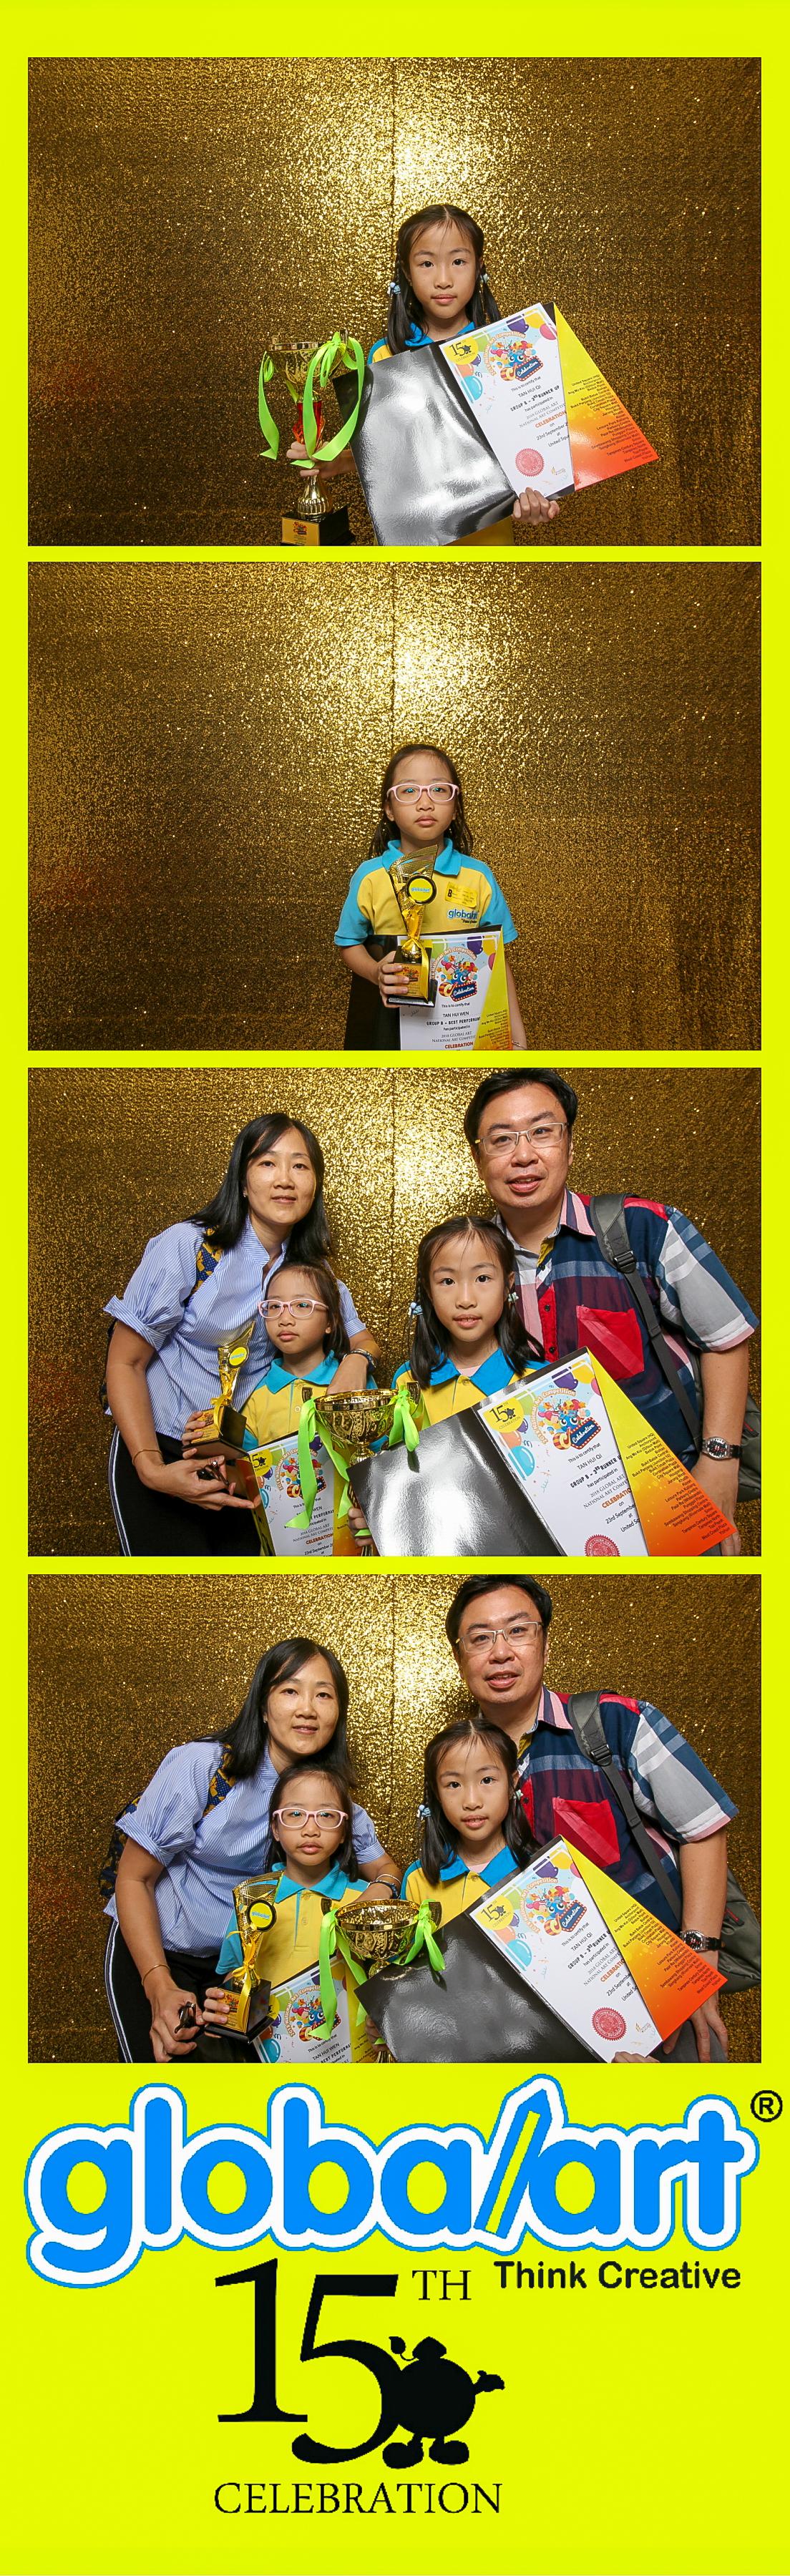 global art photo booth singapore (46)